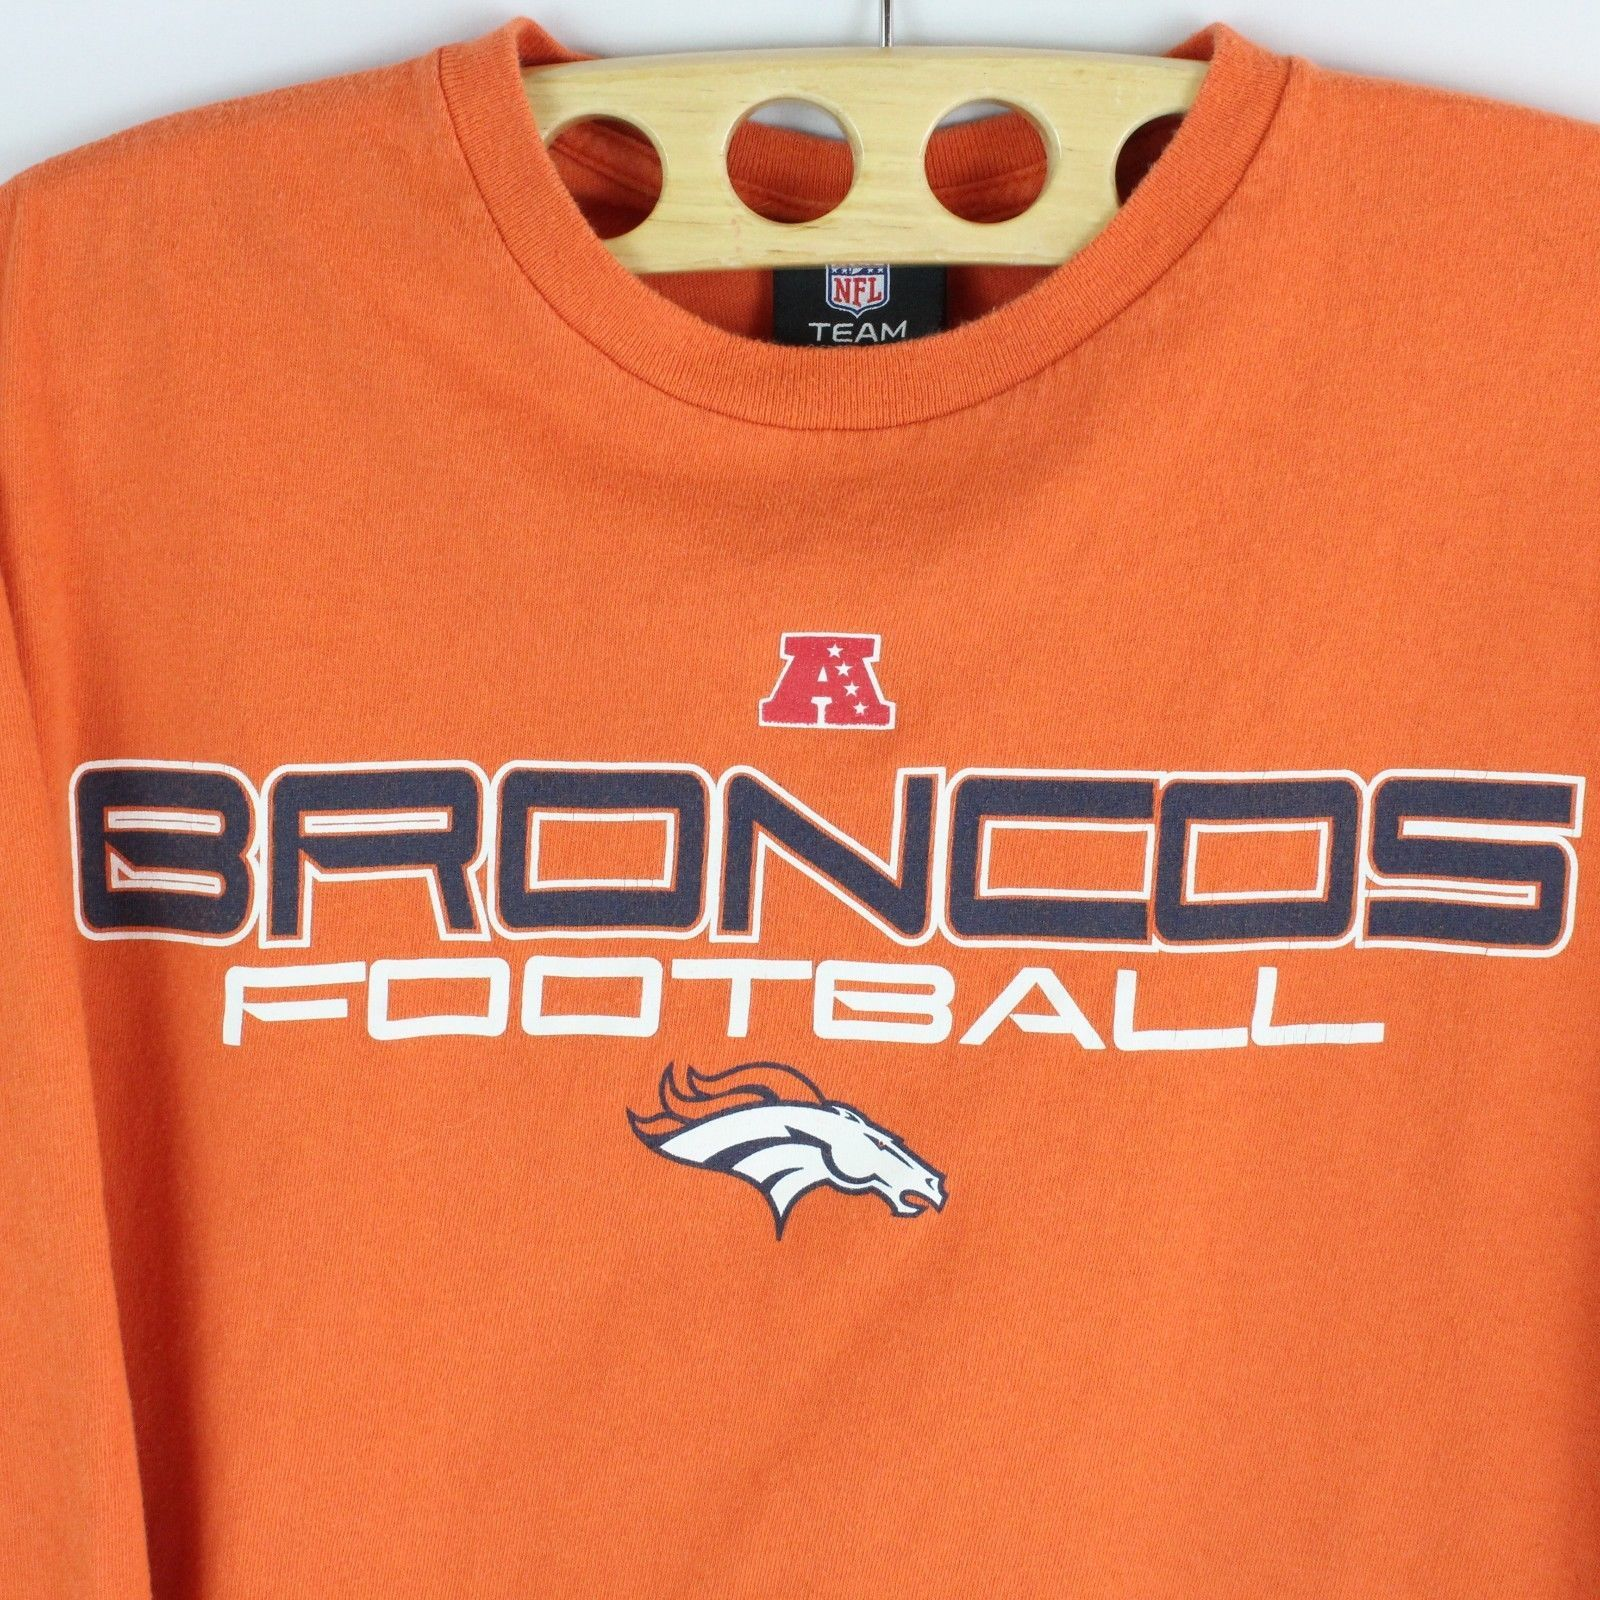 NFL Broncos De Denver Vintage T-Shirt a Manica Lunga Braccio Spellout  TAGLIA L 080786ea9